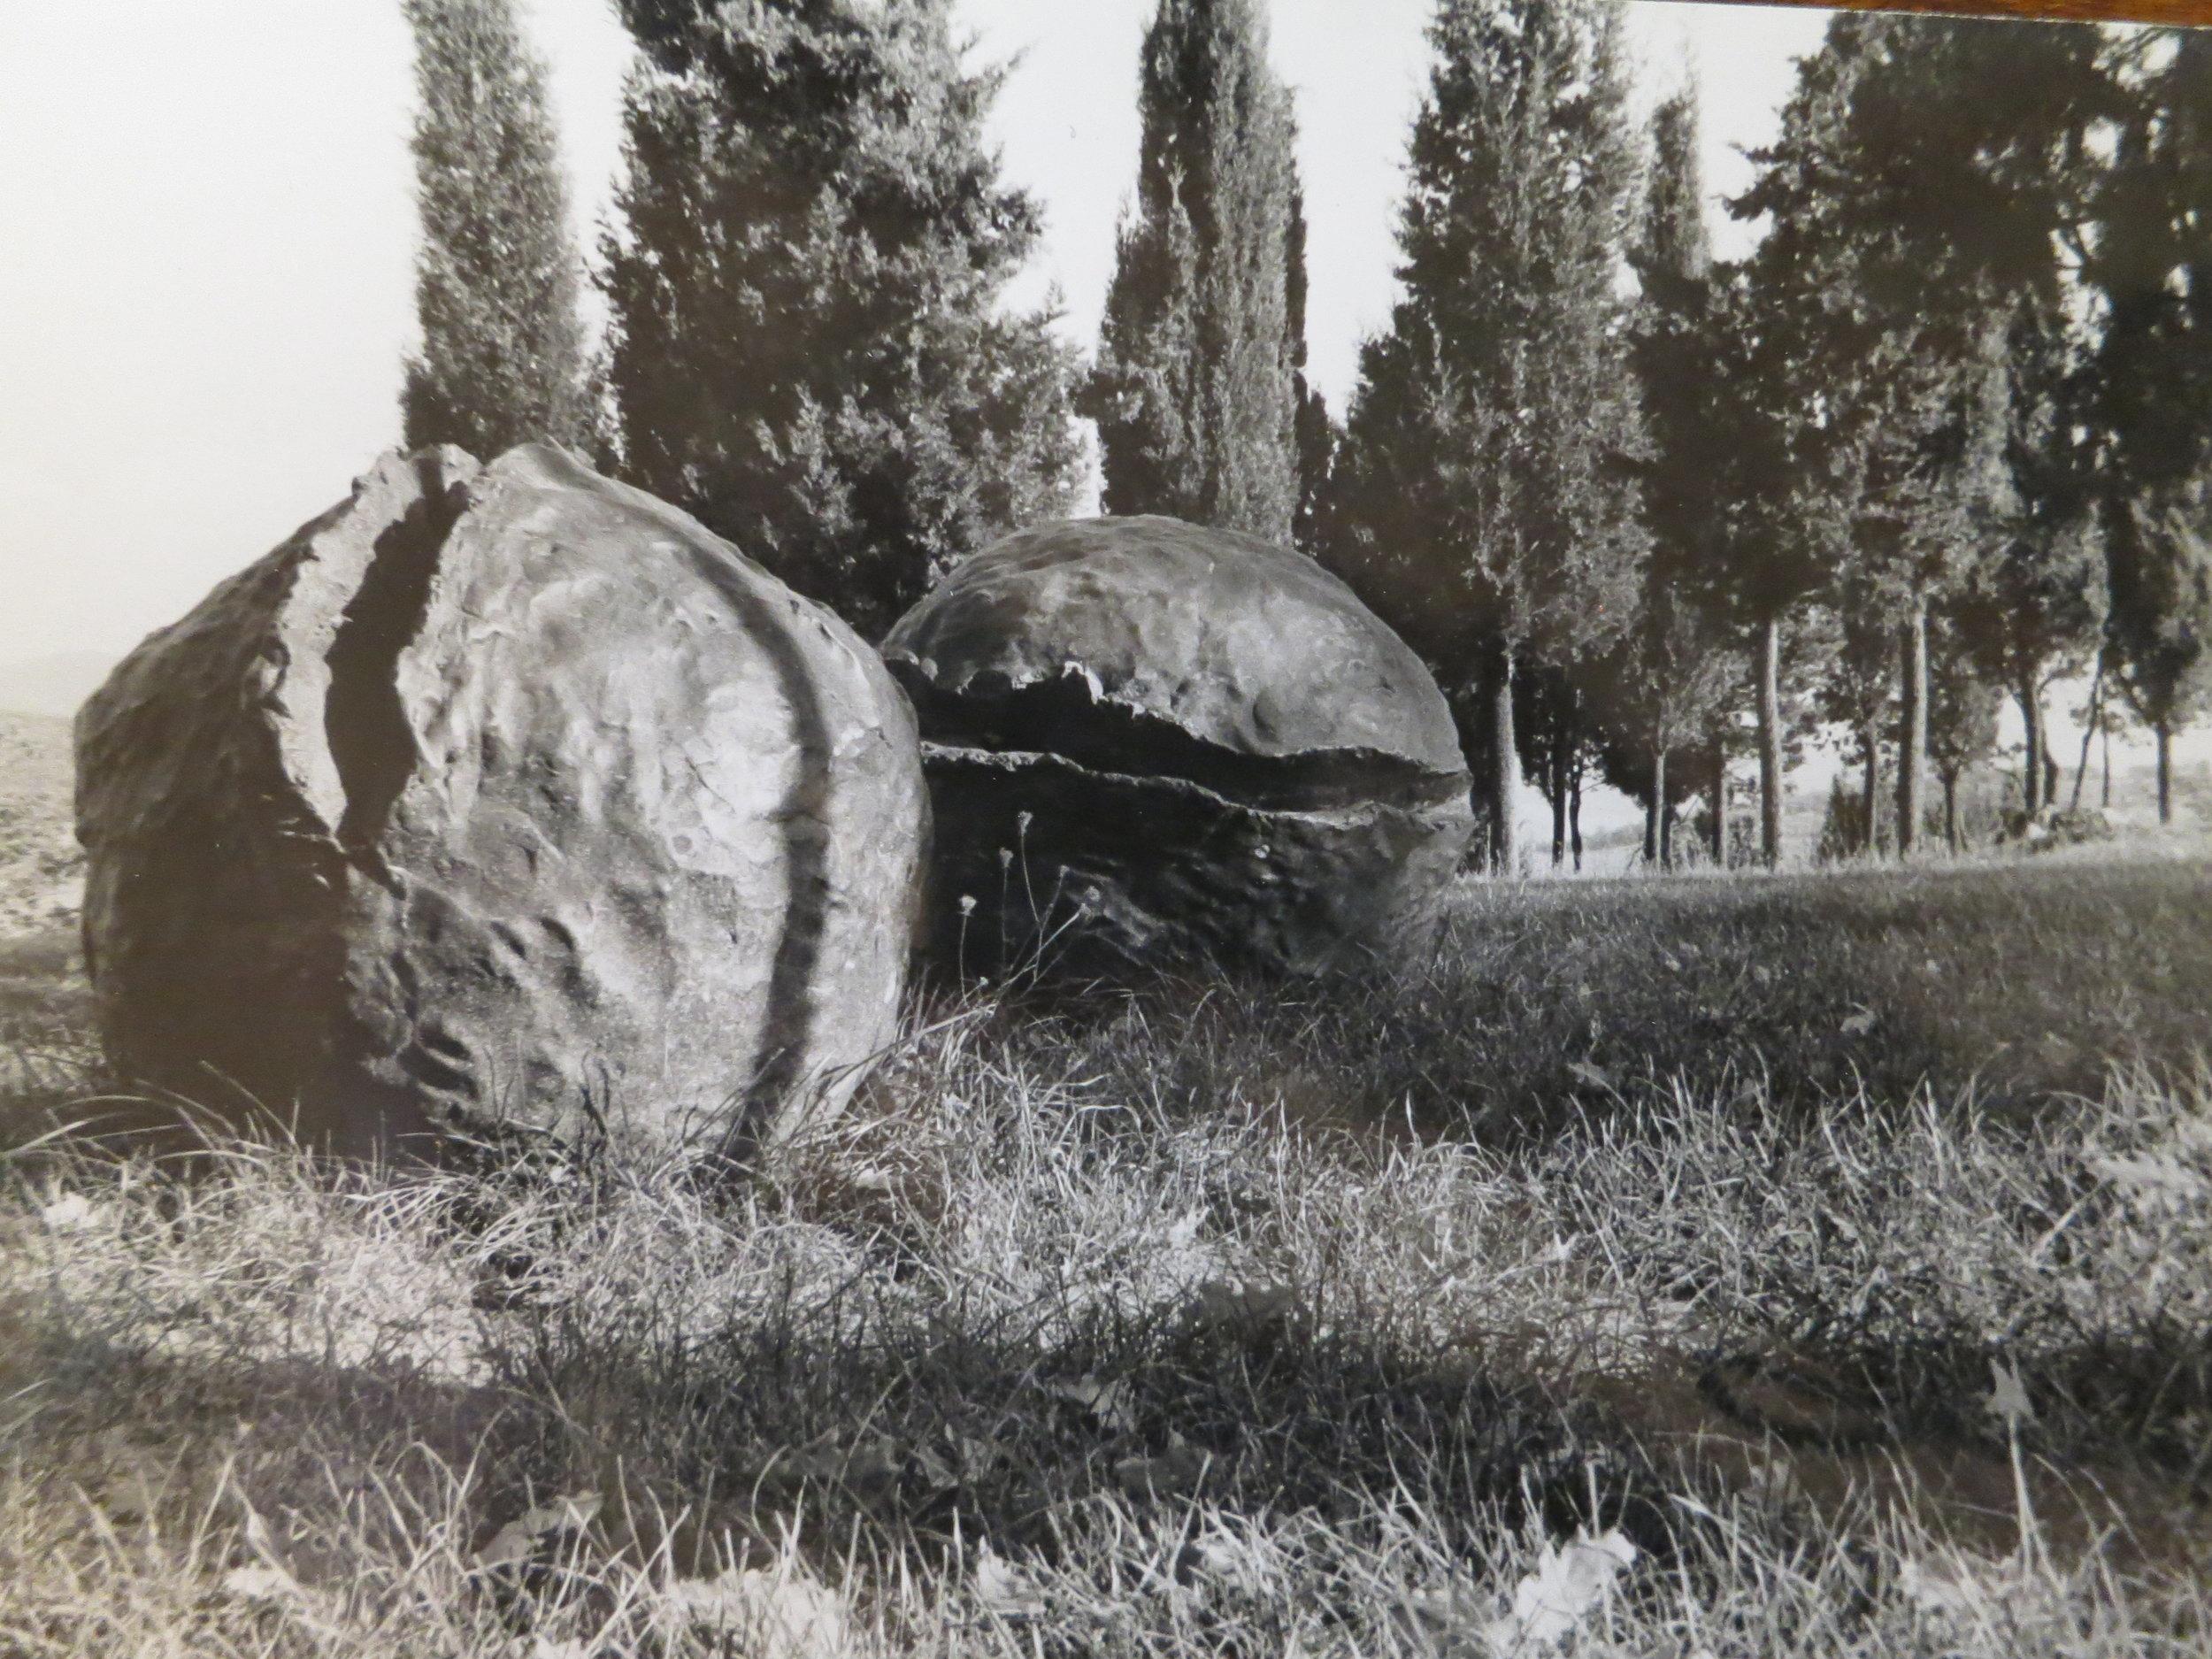 Lucio Fontana - Nature